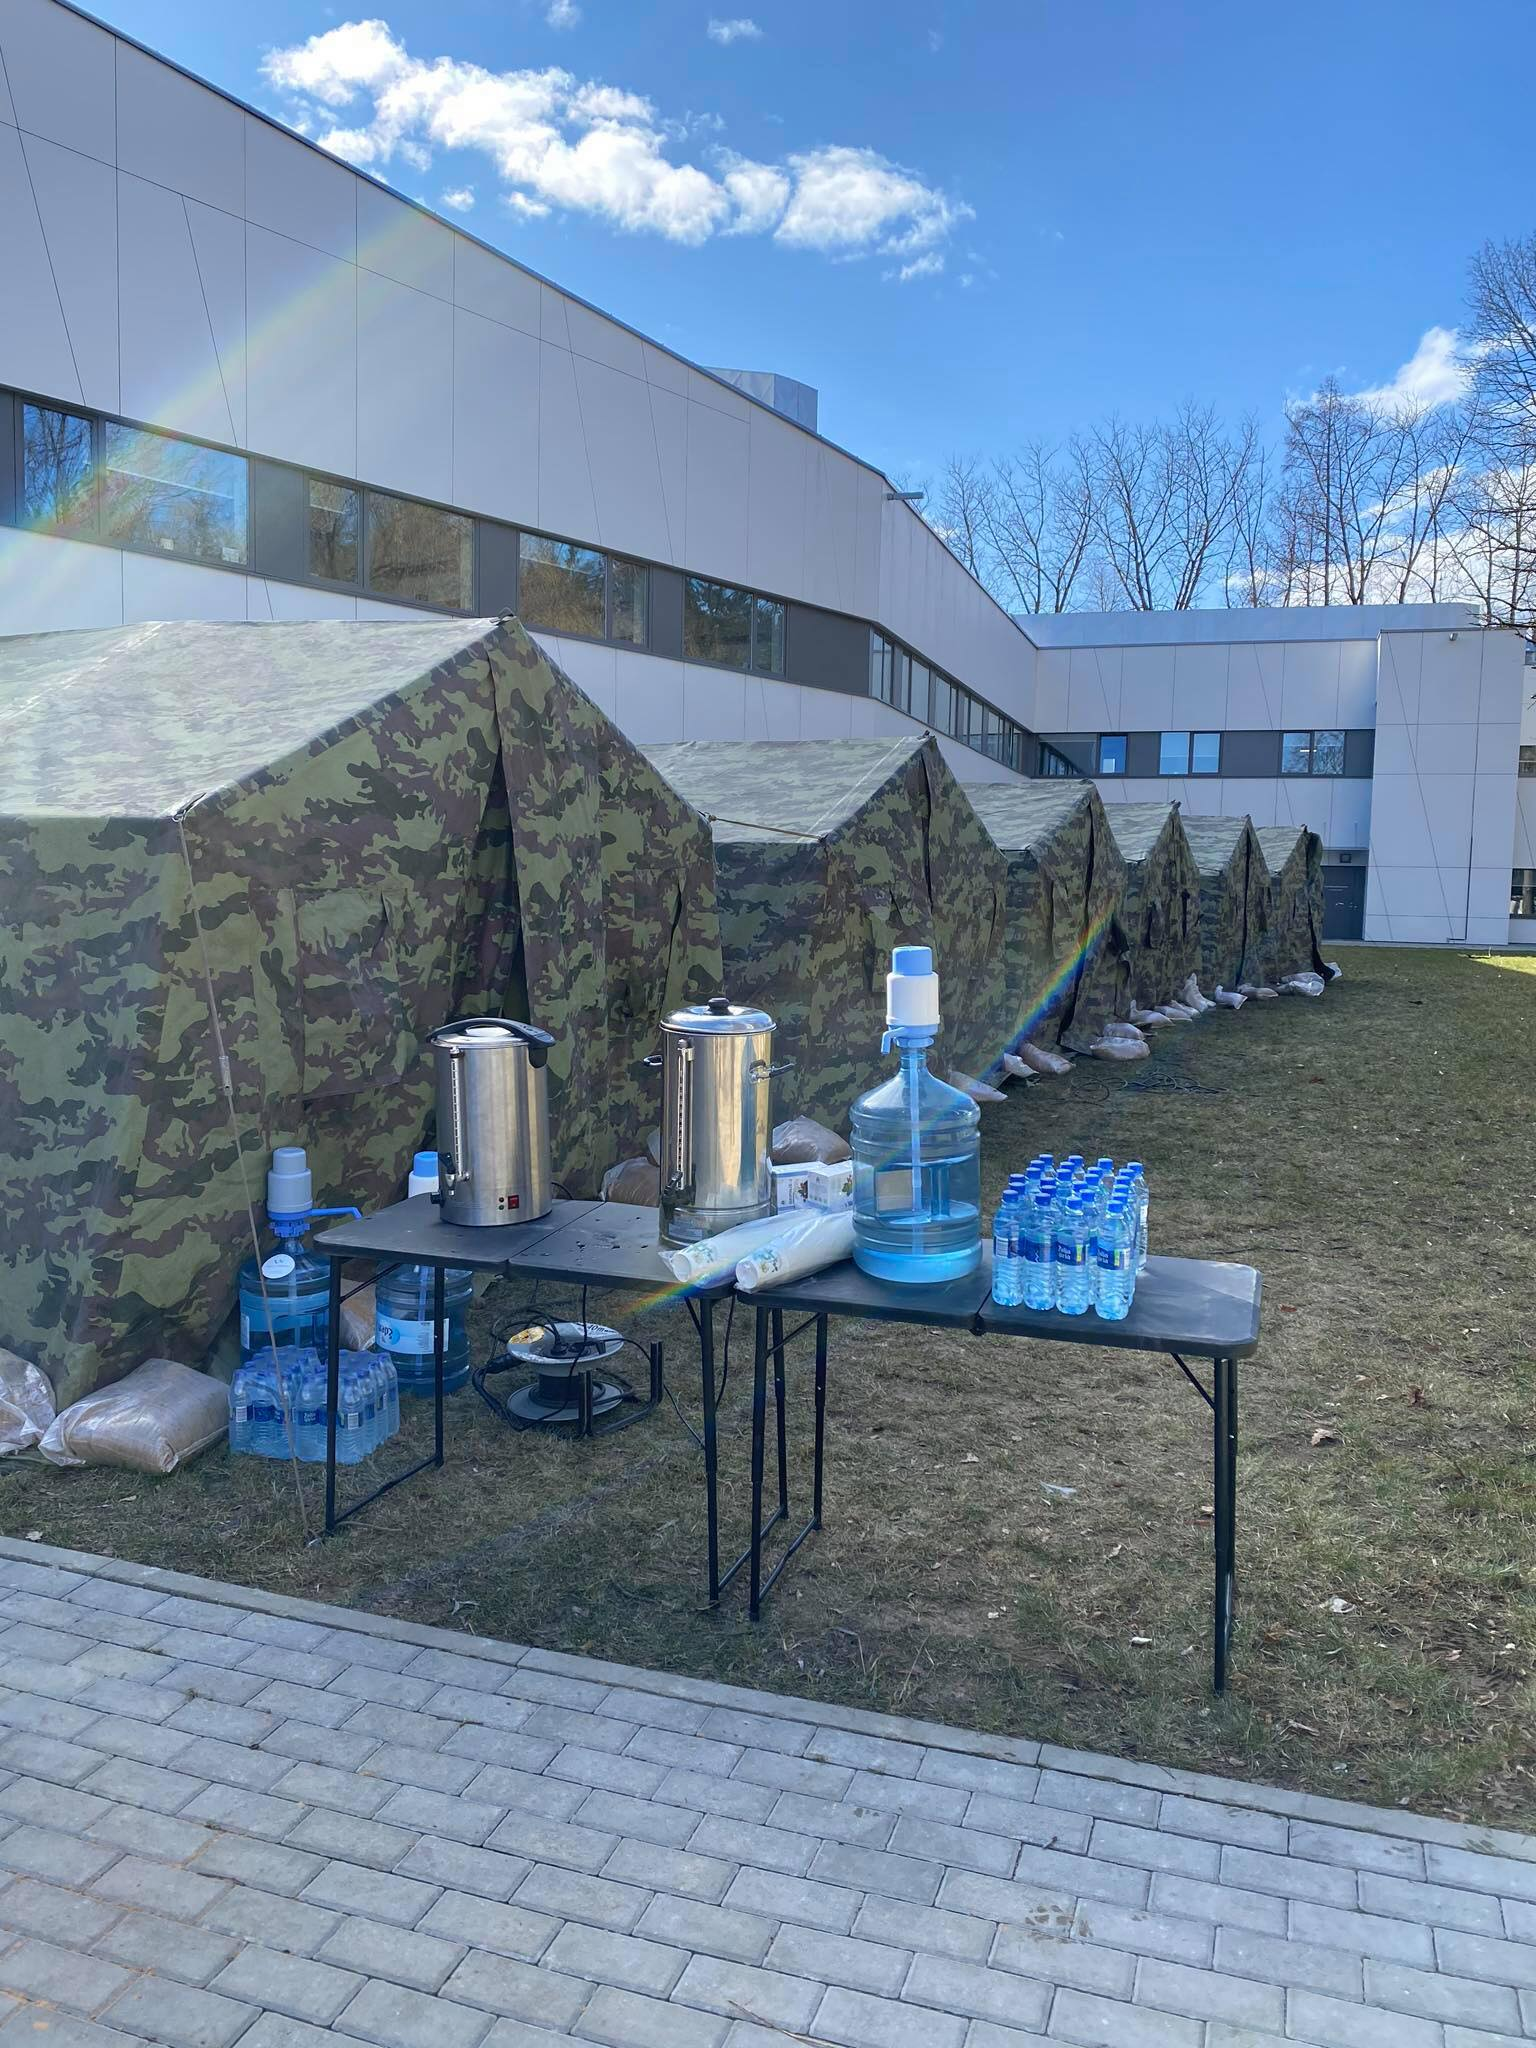 Santaros klinika Vilniuje | vilnius.lt nuotr.